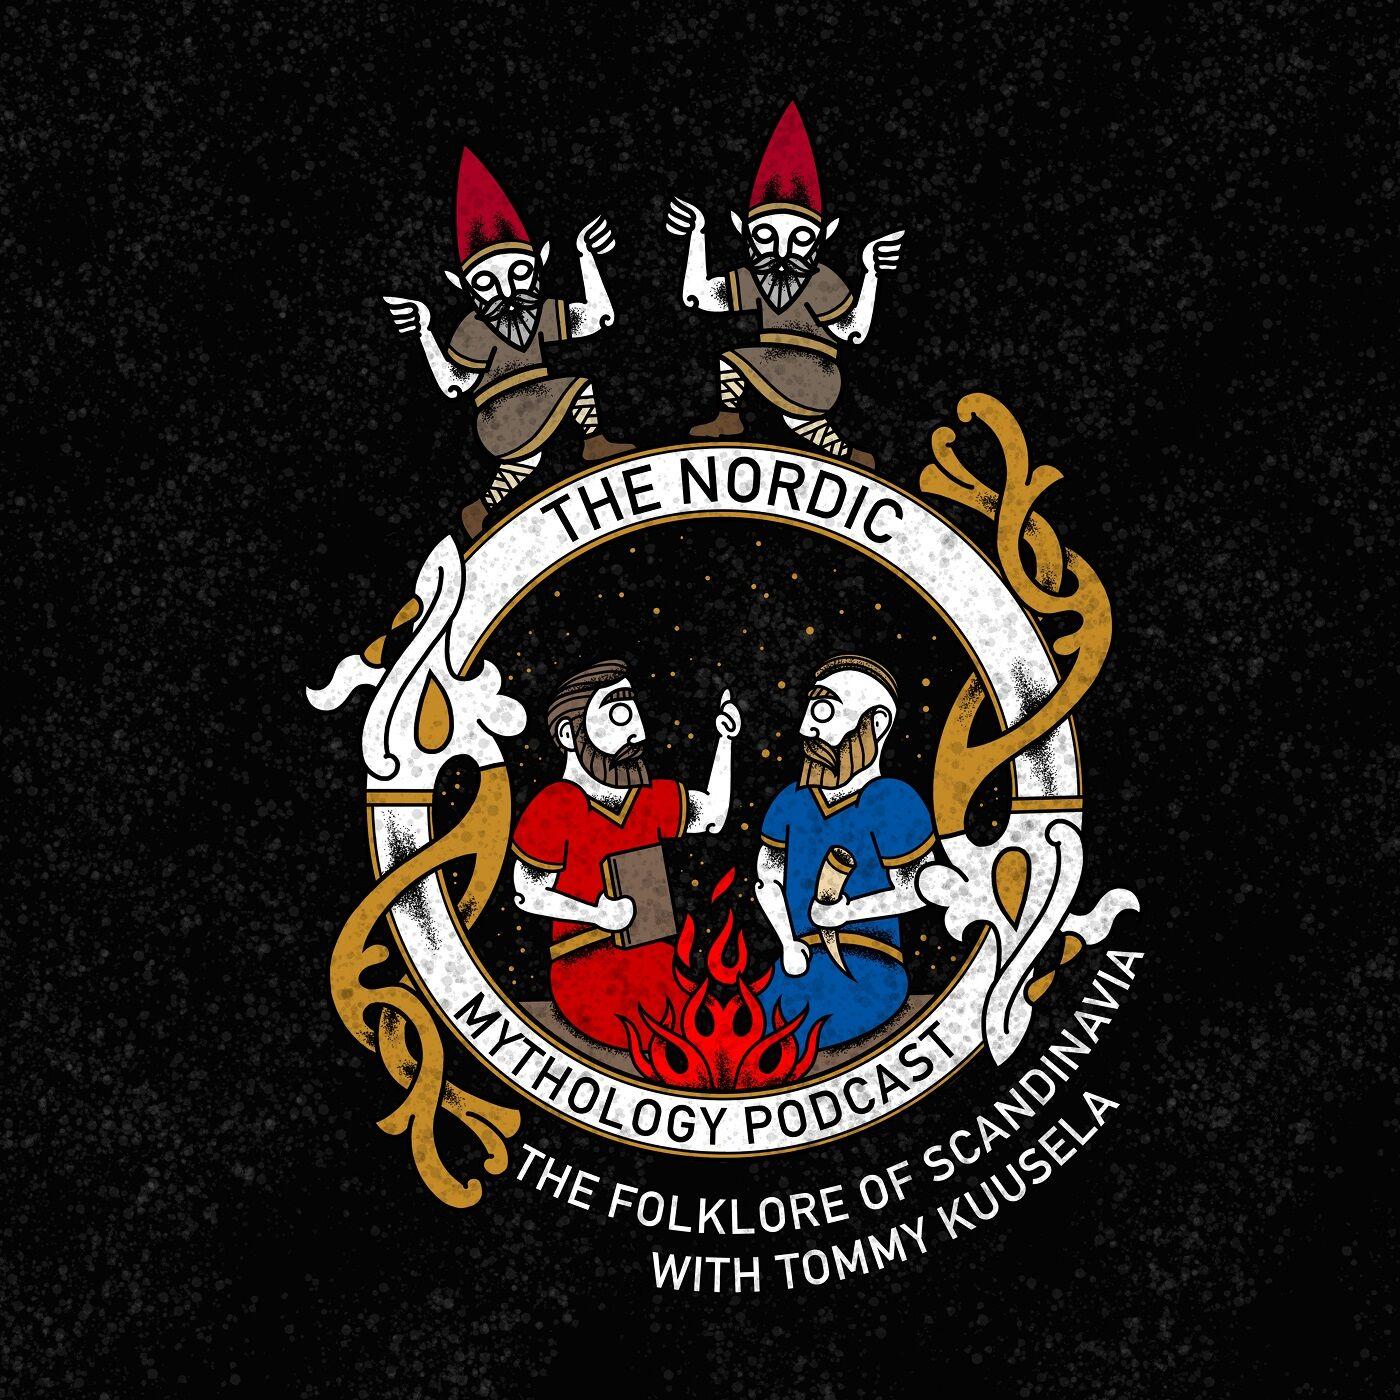 Ep 65 - The Folklore of Scandinavia with Tommy Kuusela